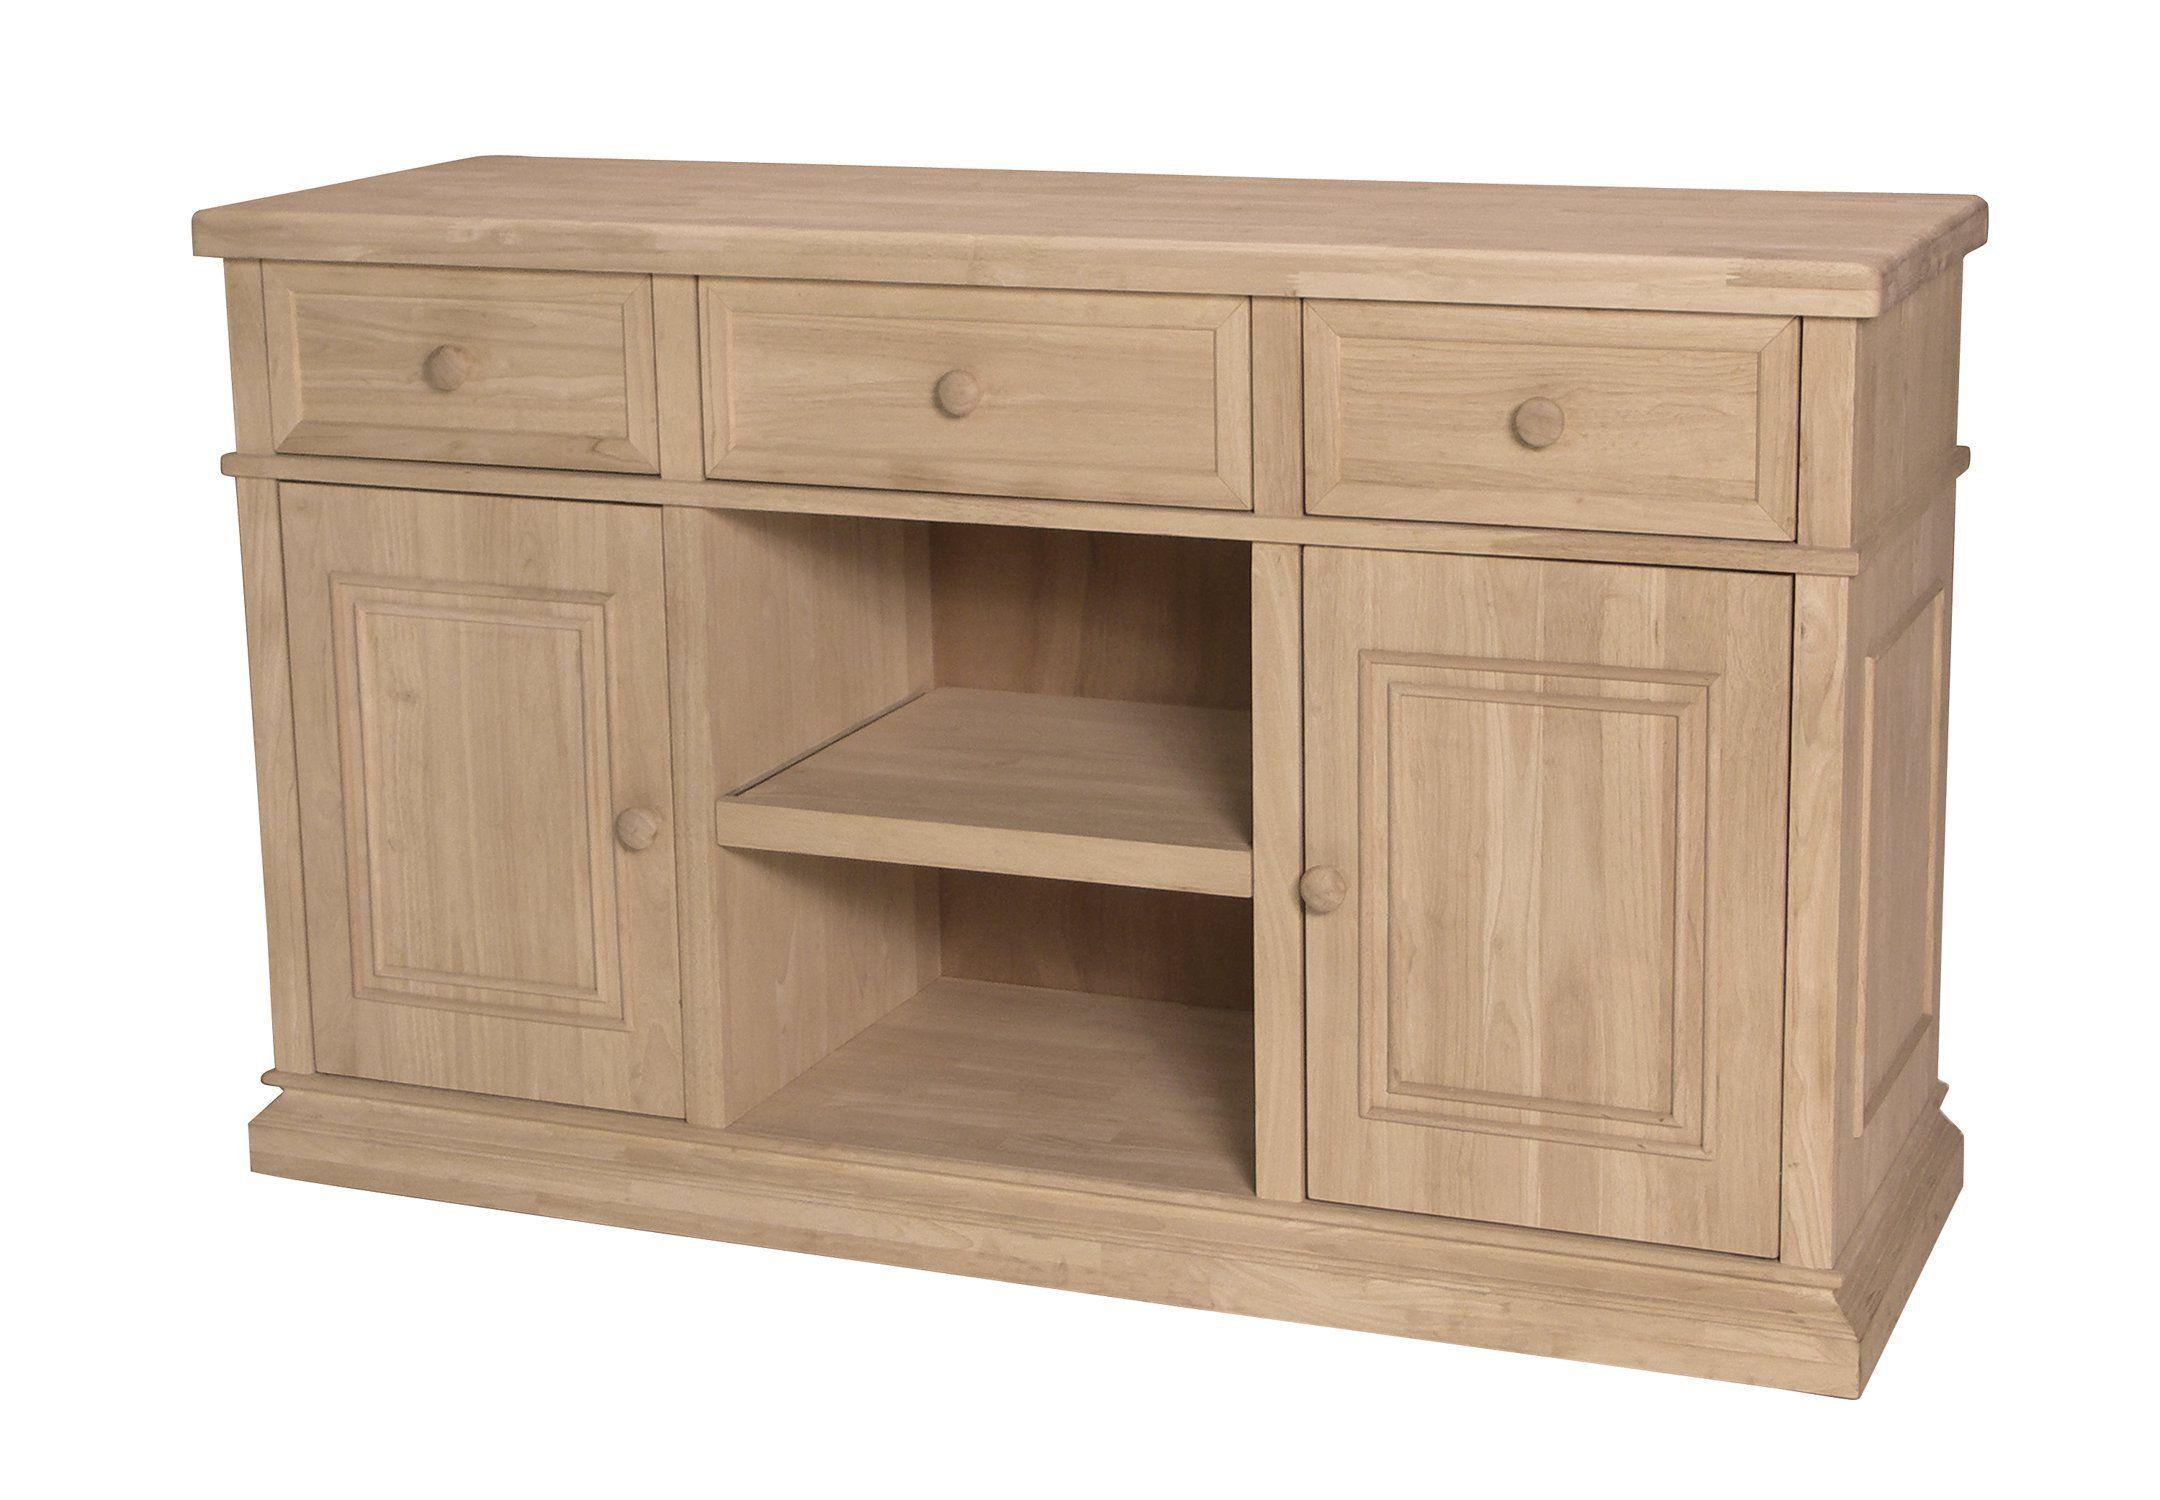 Sturbridge Hardwood Buffet 60 Quot Products Furniture